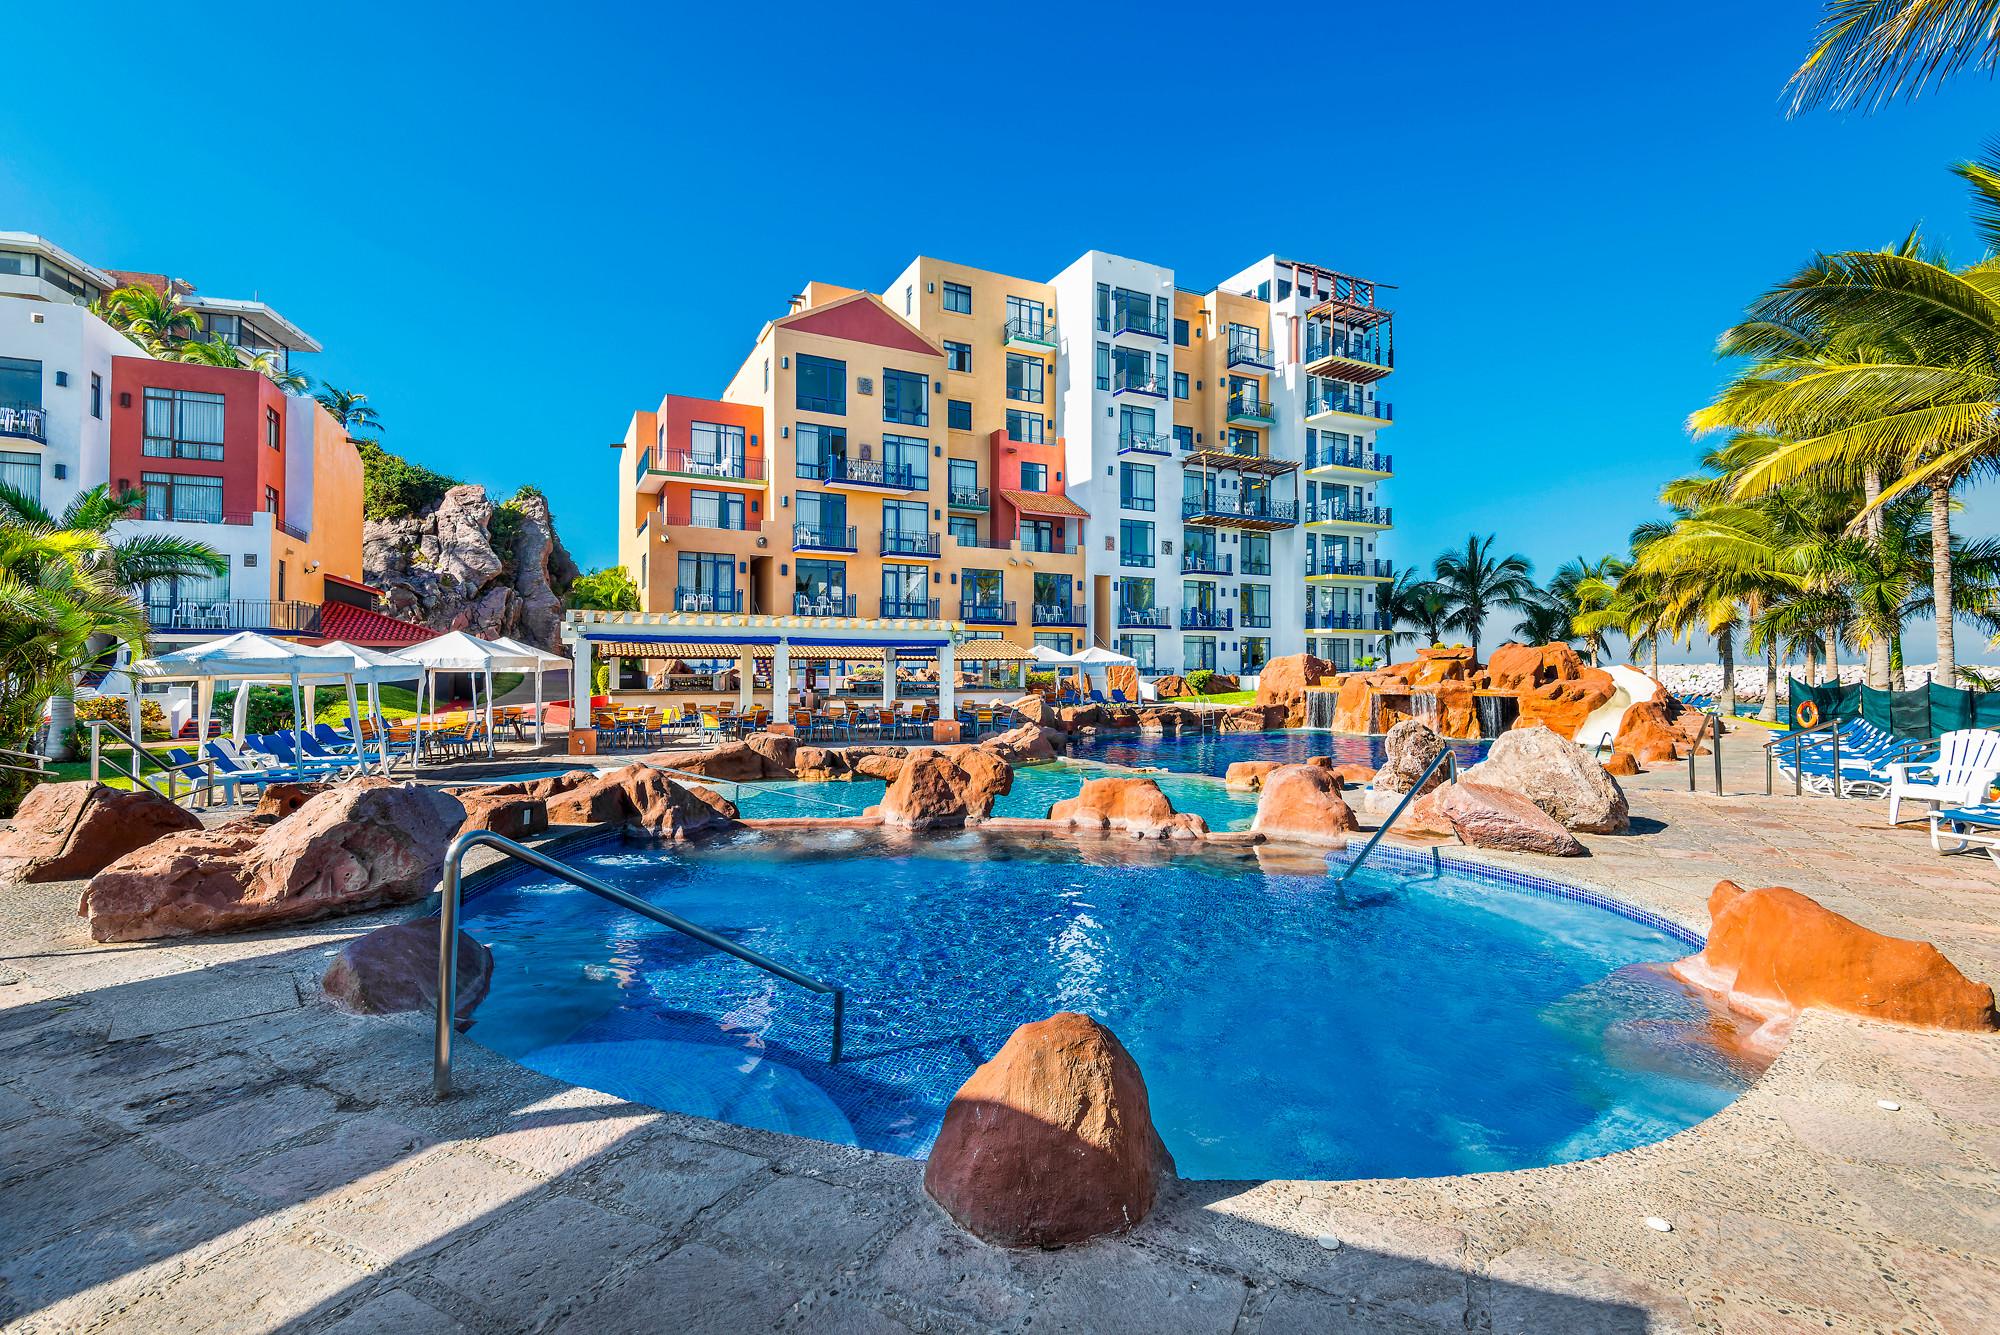 El Cid Marina Beach Hotel